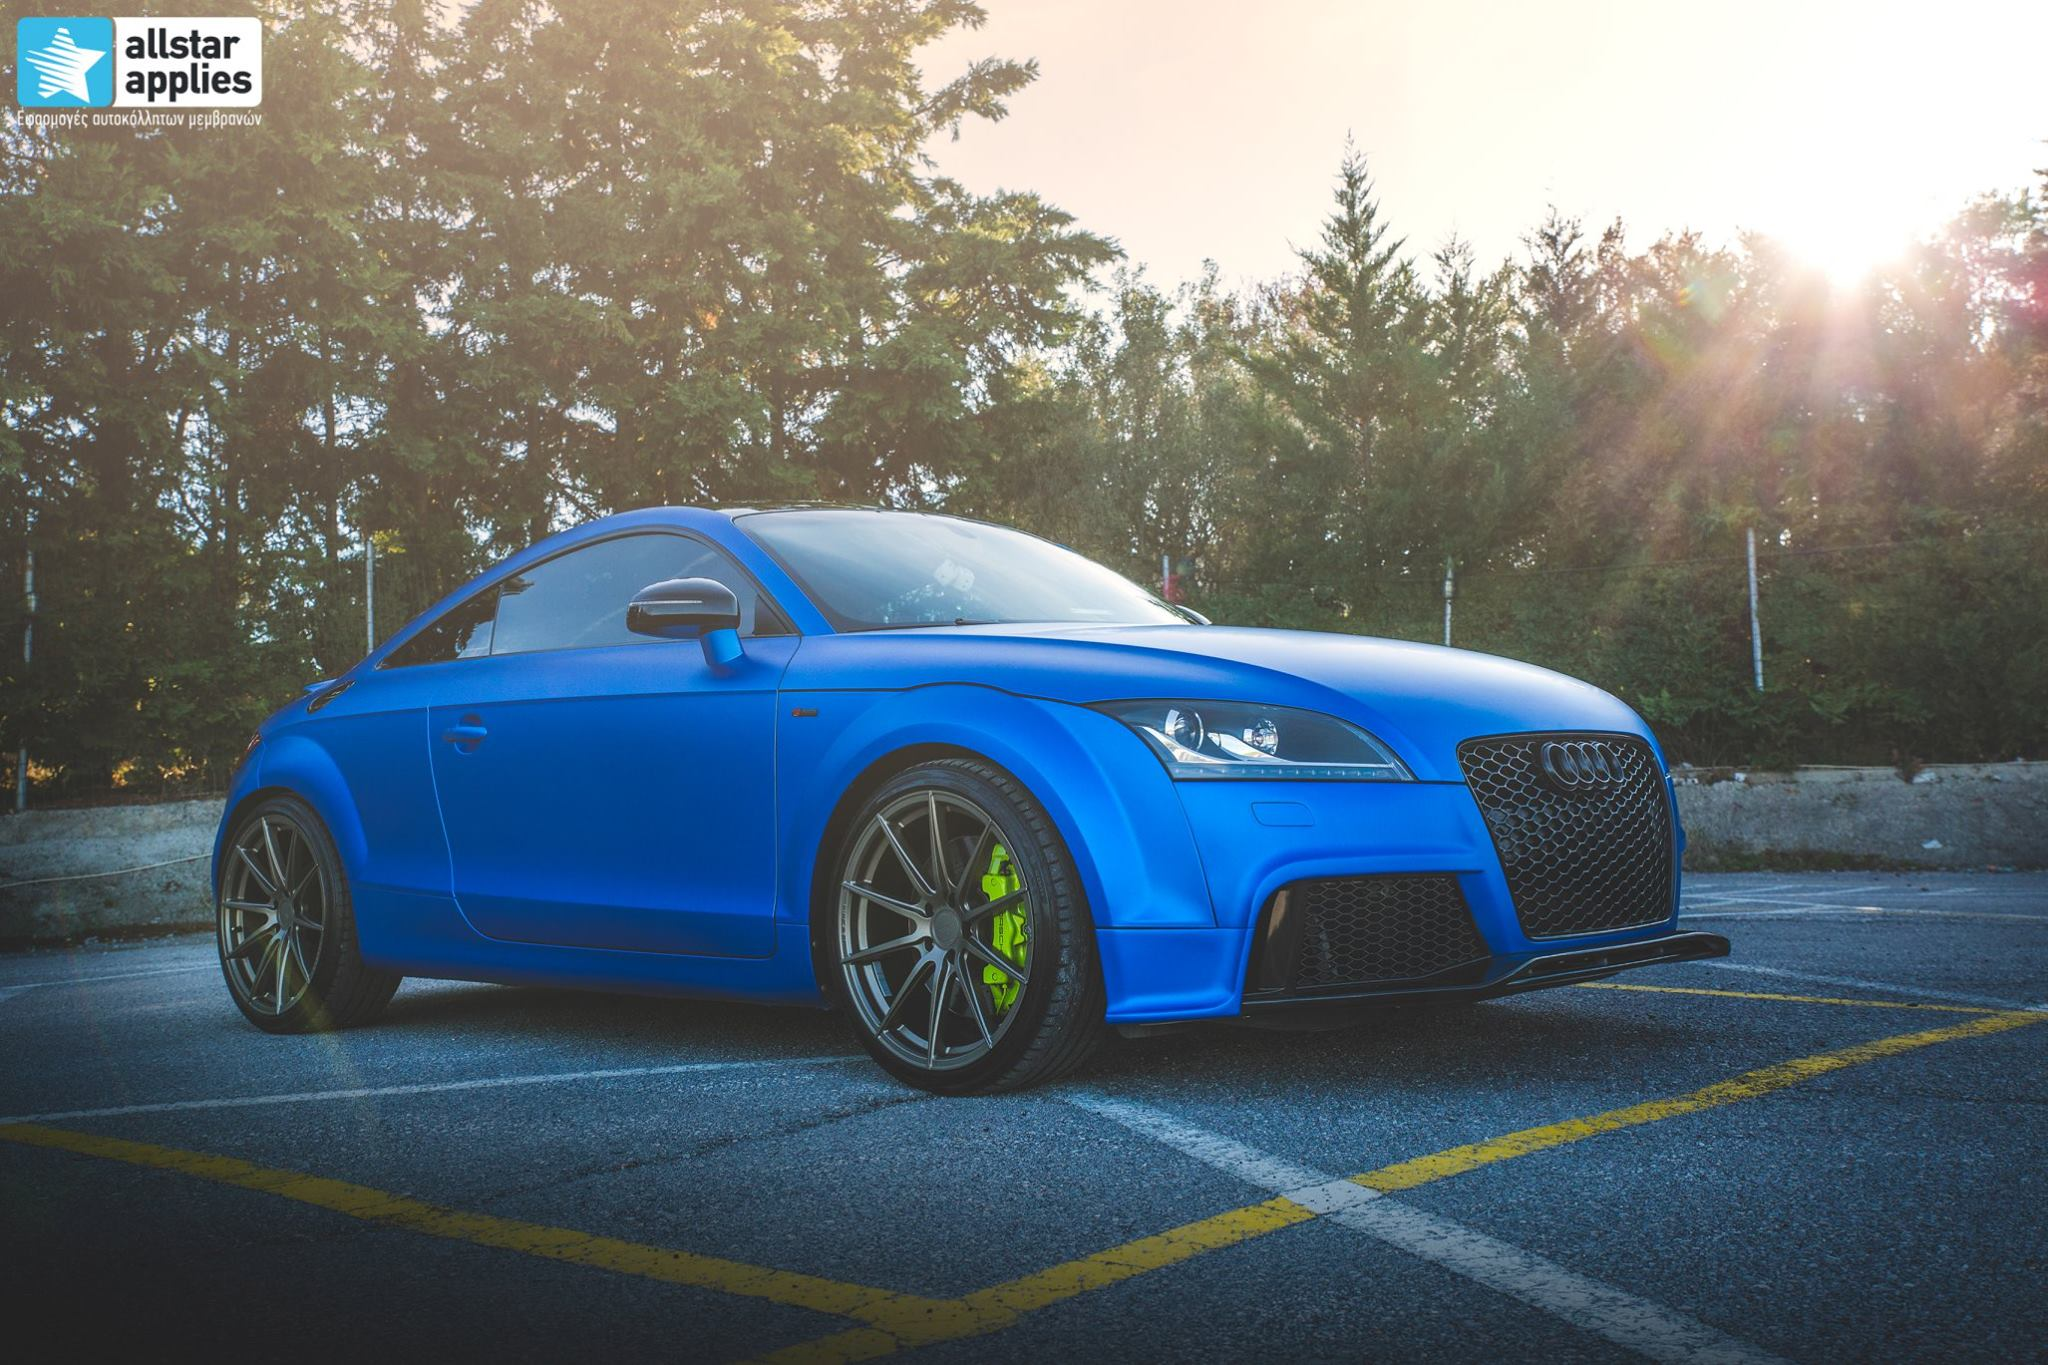 Audi TT - Matte Iced Blue + Ispiri Wheels FFR1 Matte (12)